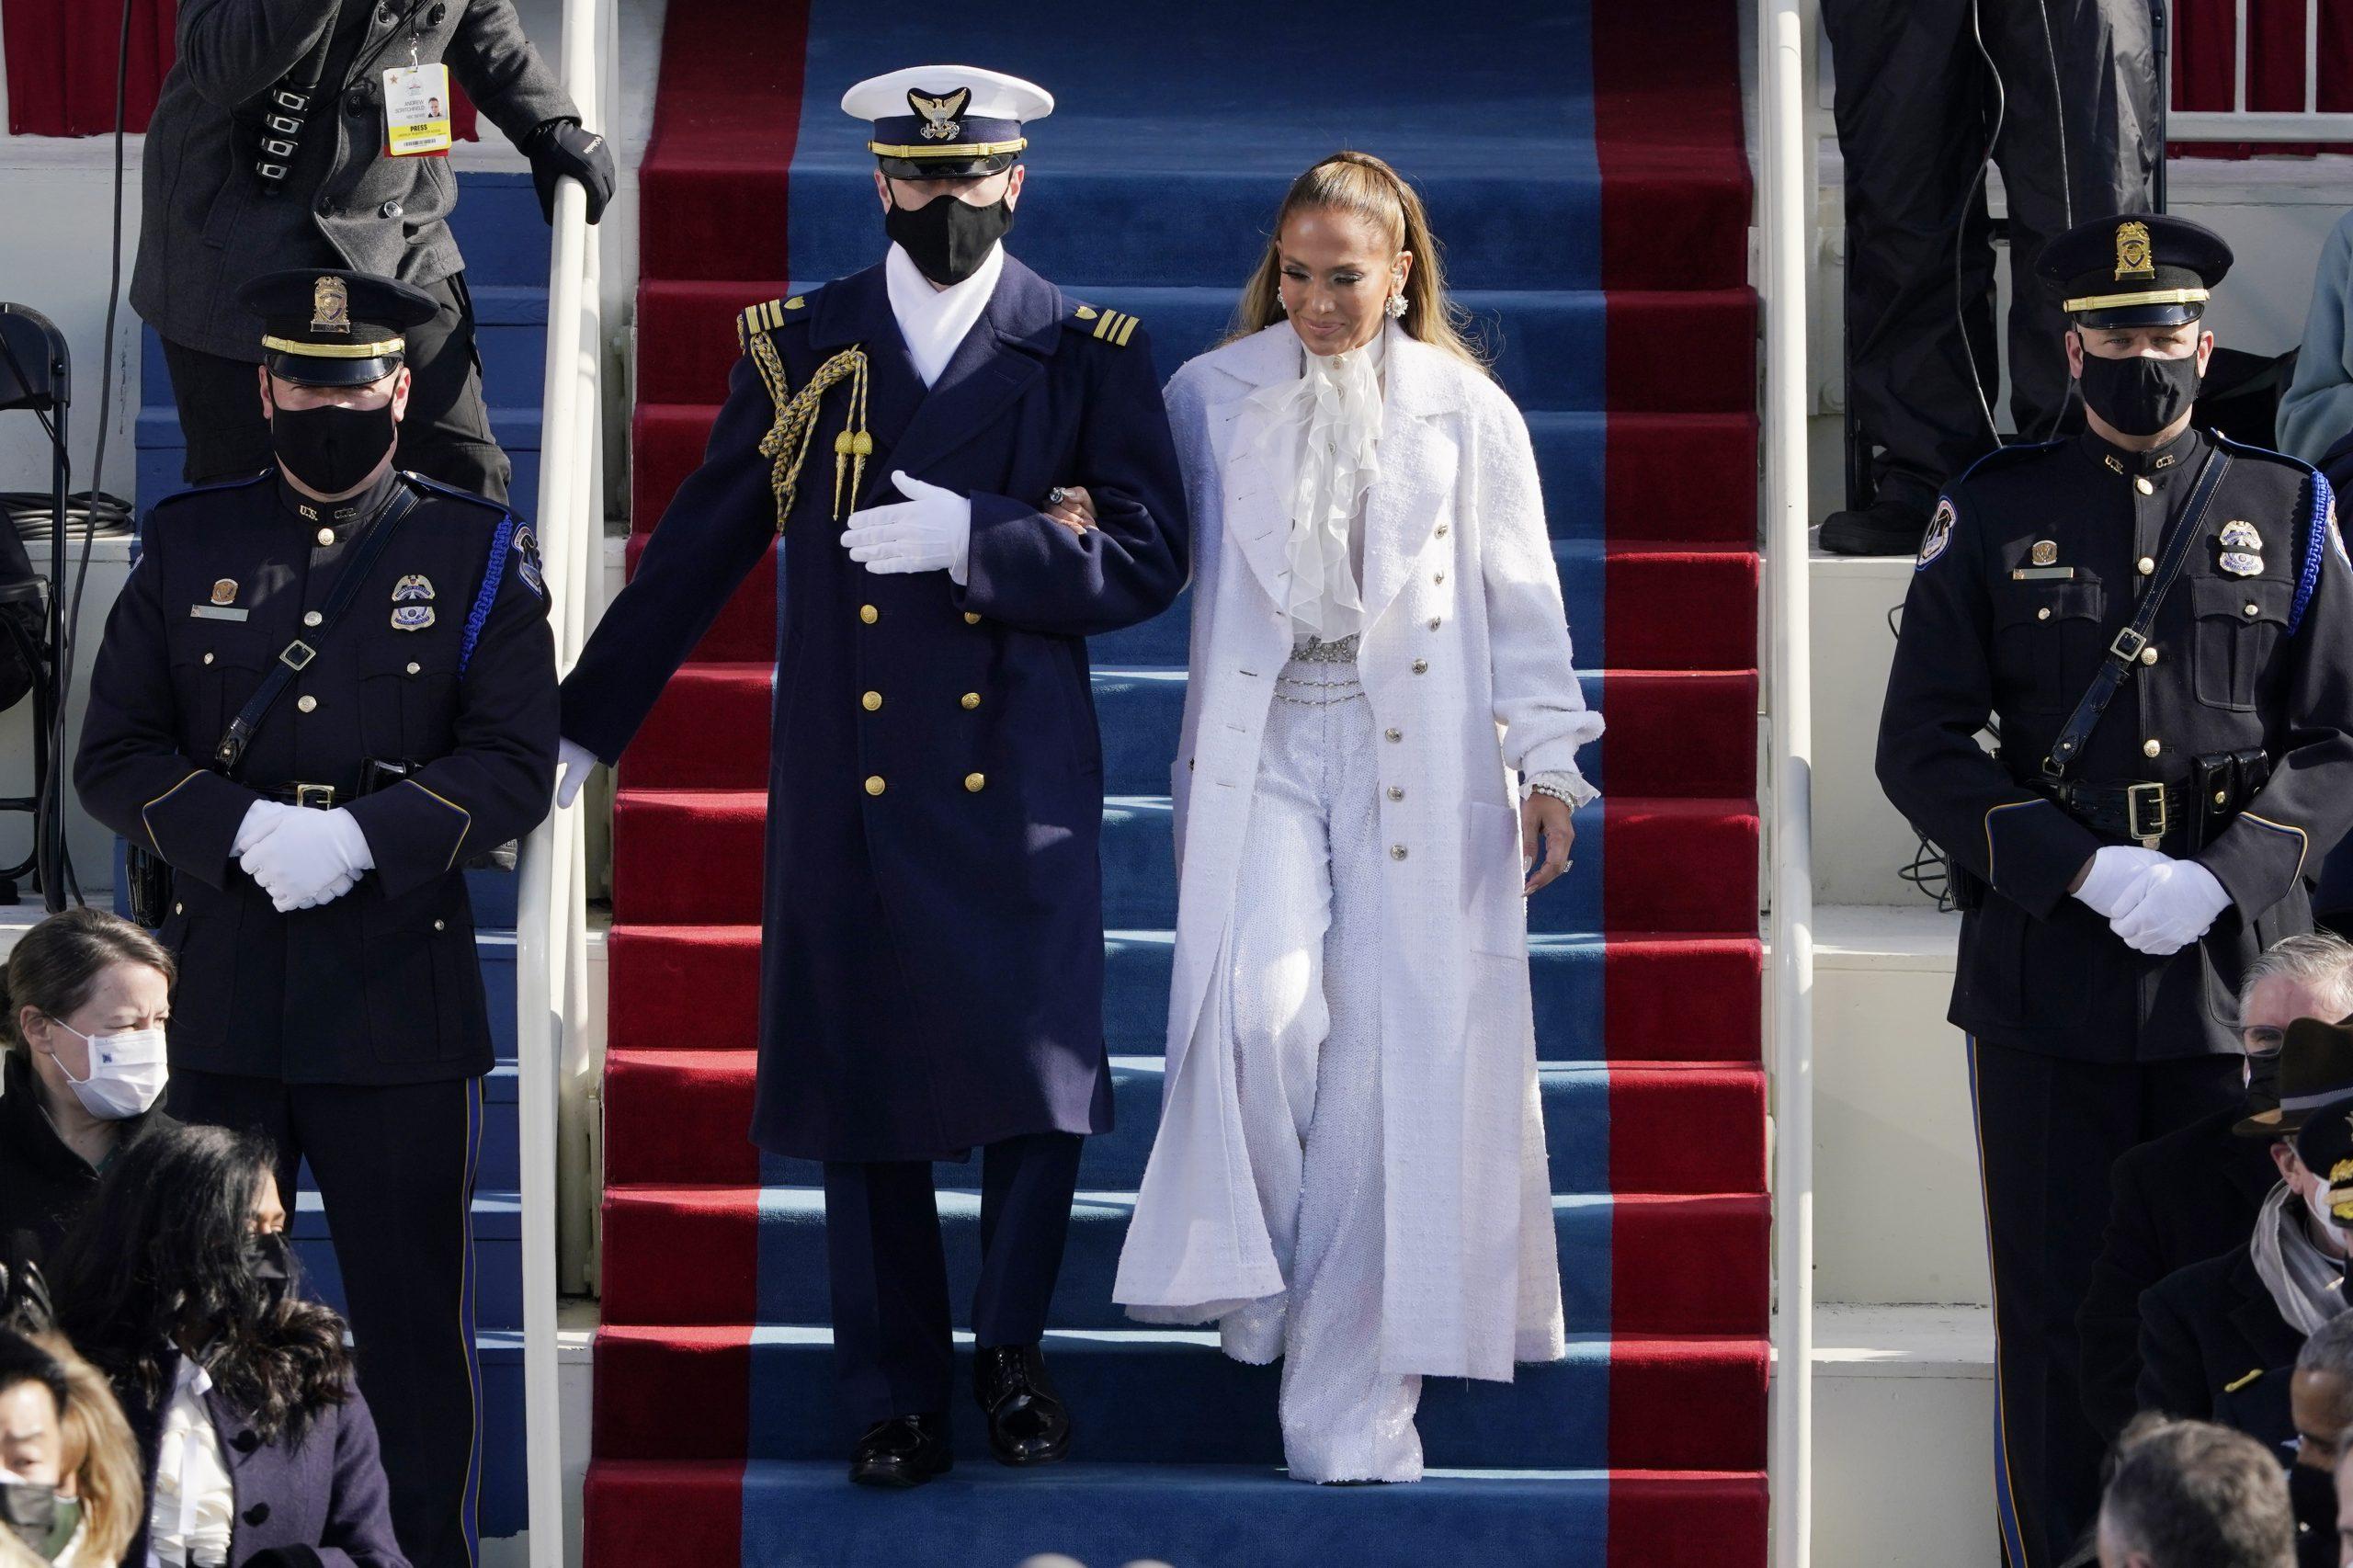 De diepere betekenis achter die prachtige inauguratie-outfits